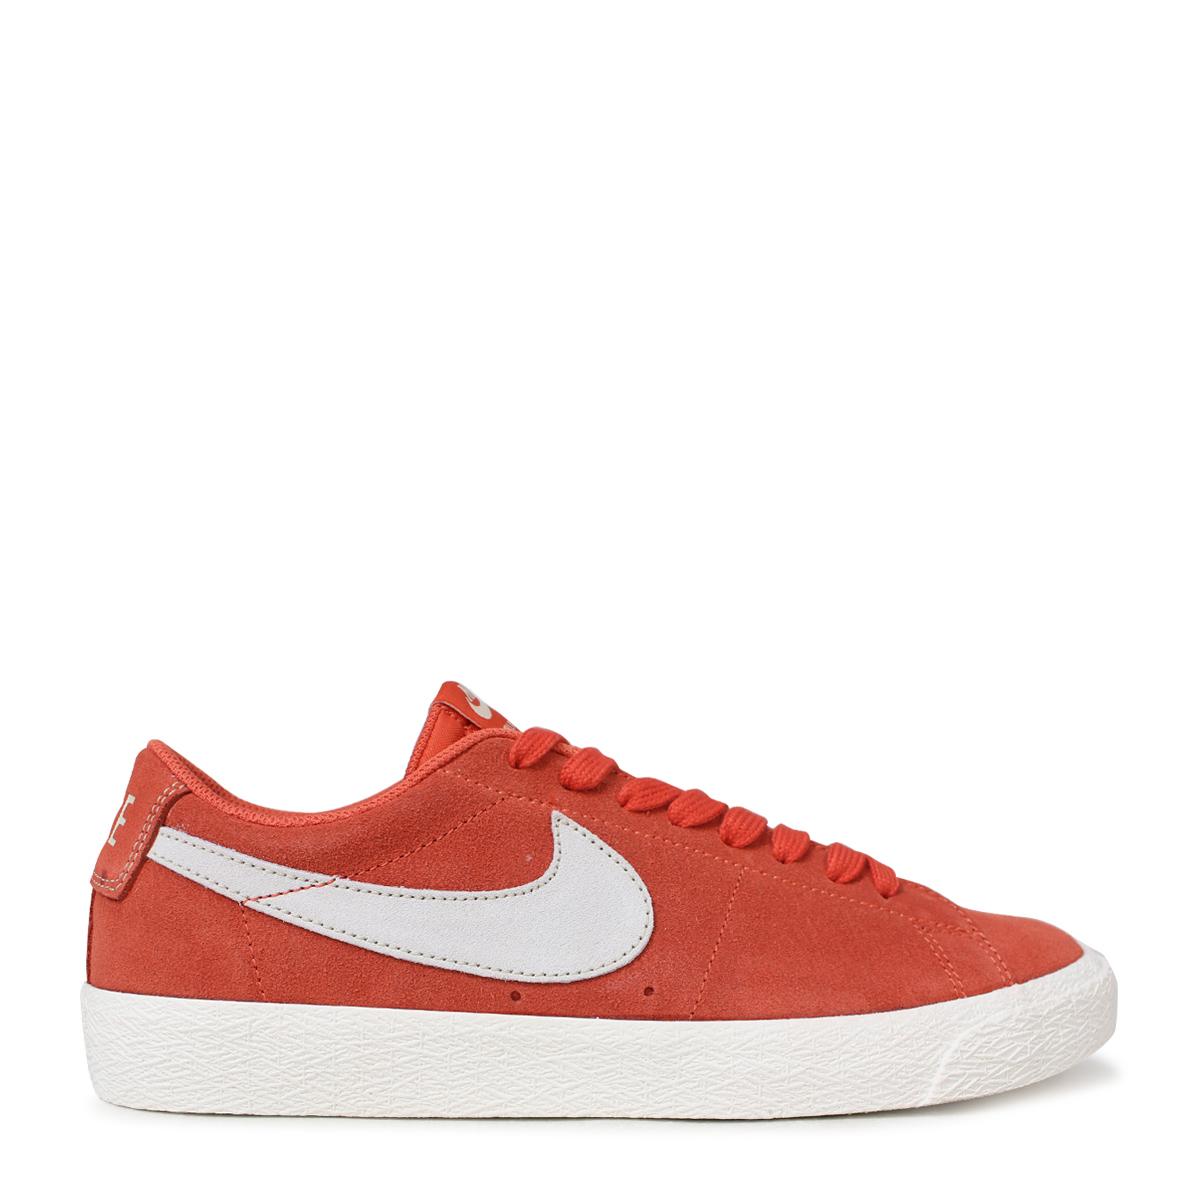 competitive price 22370 db852 ... An NIKE BLAZER ZOOM LOW Nike SB blazer low sneakers men 864,347-800  orange ...